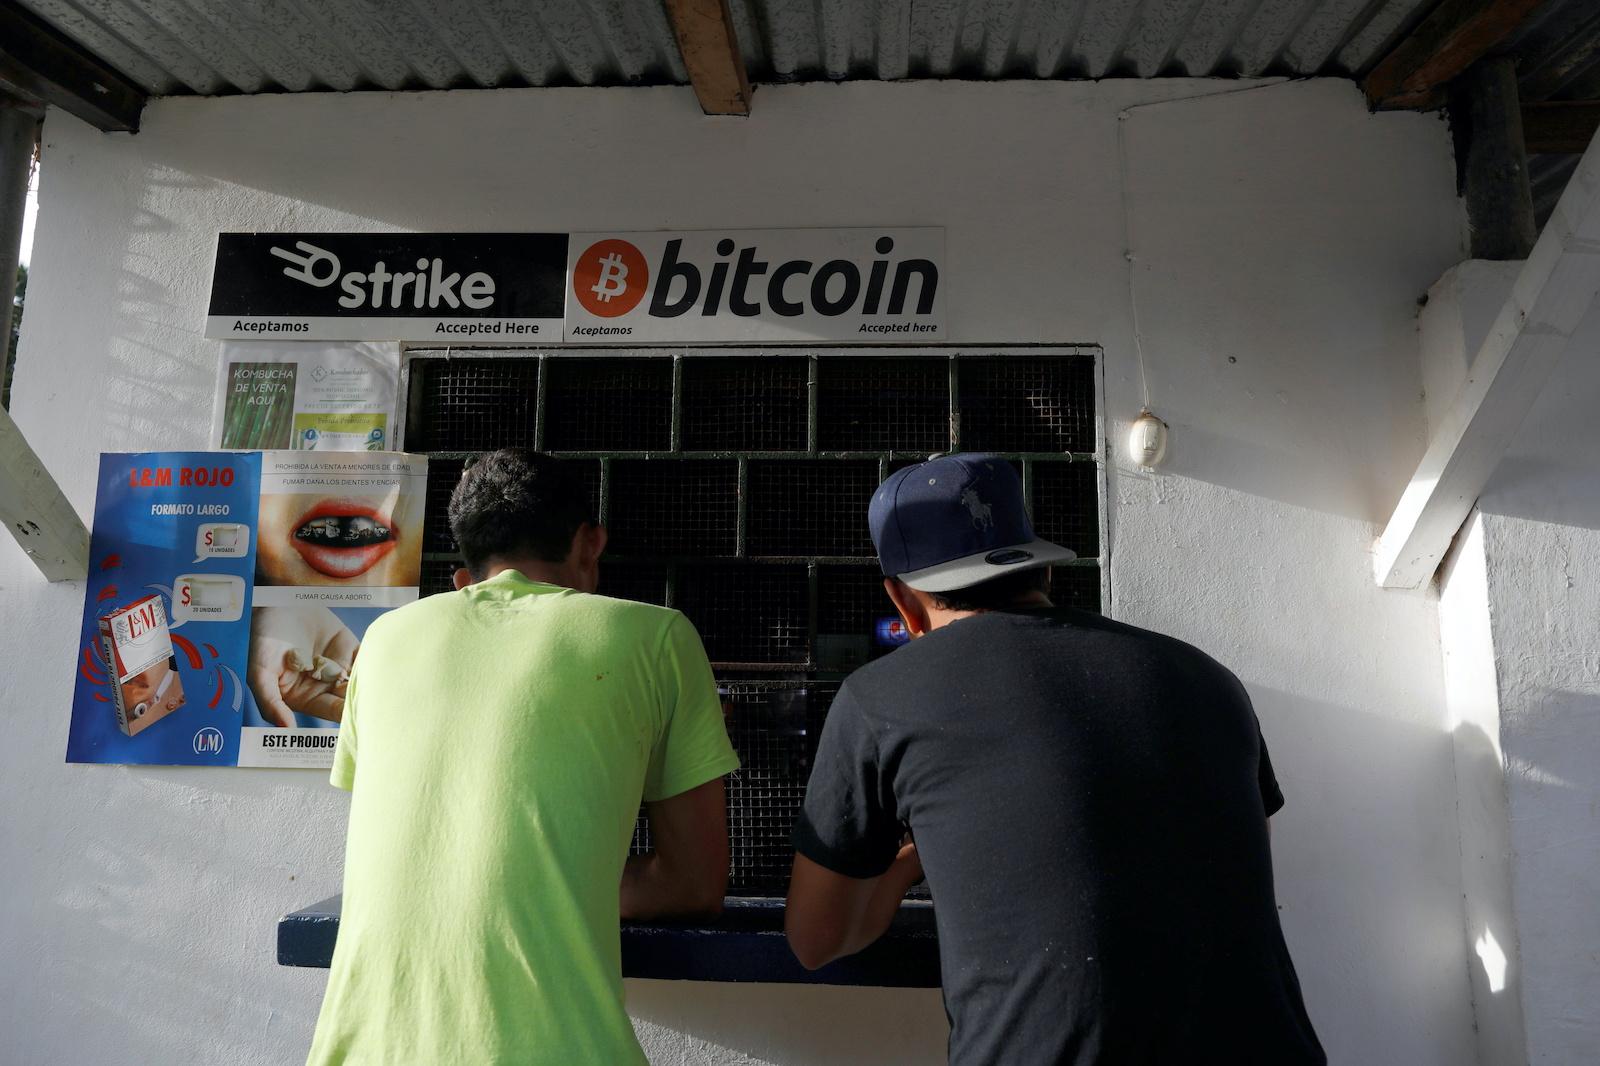 Men buy snacks at a store where bitcoins are accepted at El Zonte Beach in Chiltiupan, El Salvador June 16, 2021. REUTERS/Jose Cabezas - RC2Z1O9MEUEP